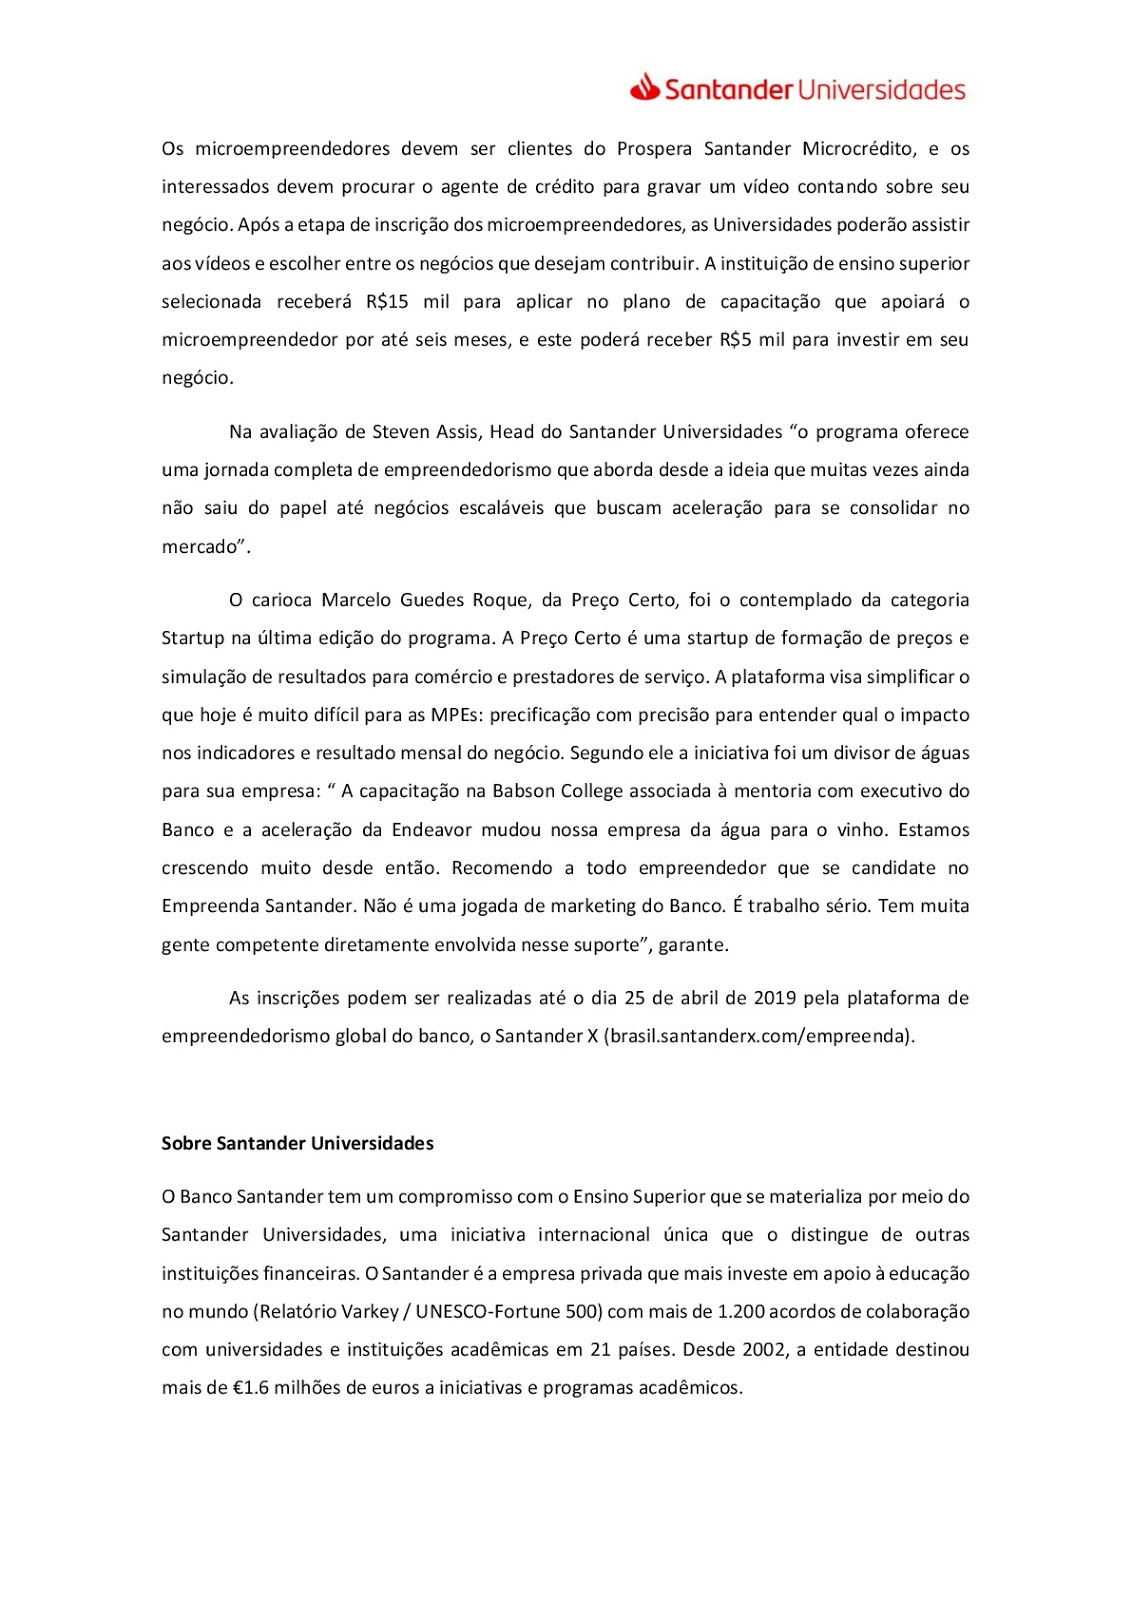 bce67a286 O Santander Universidades apoiará com aporte financeiro, bolsas de estudos  na Babson College e mentoria.